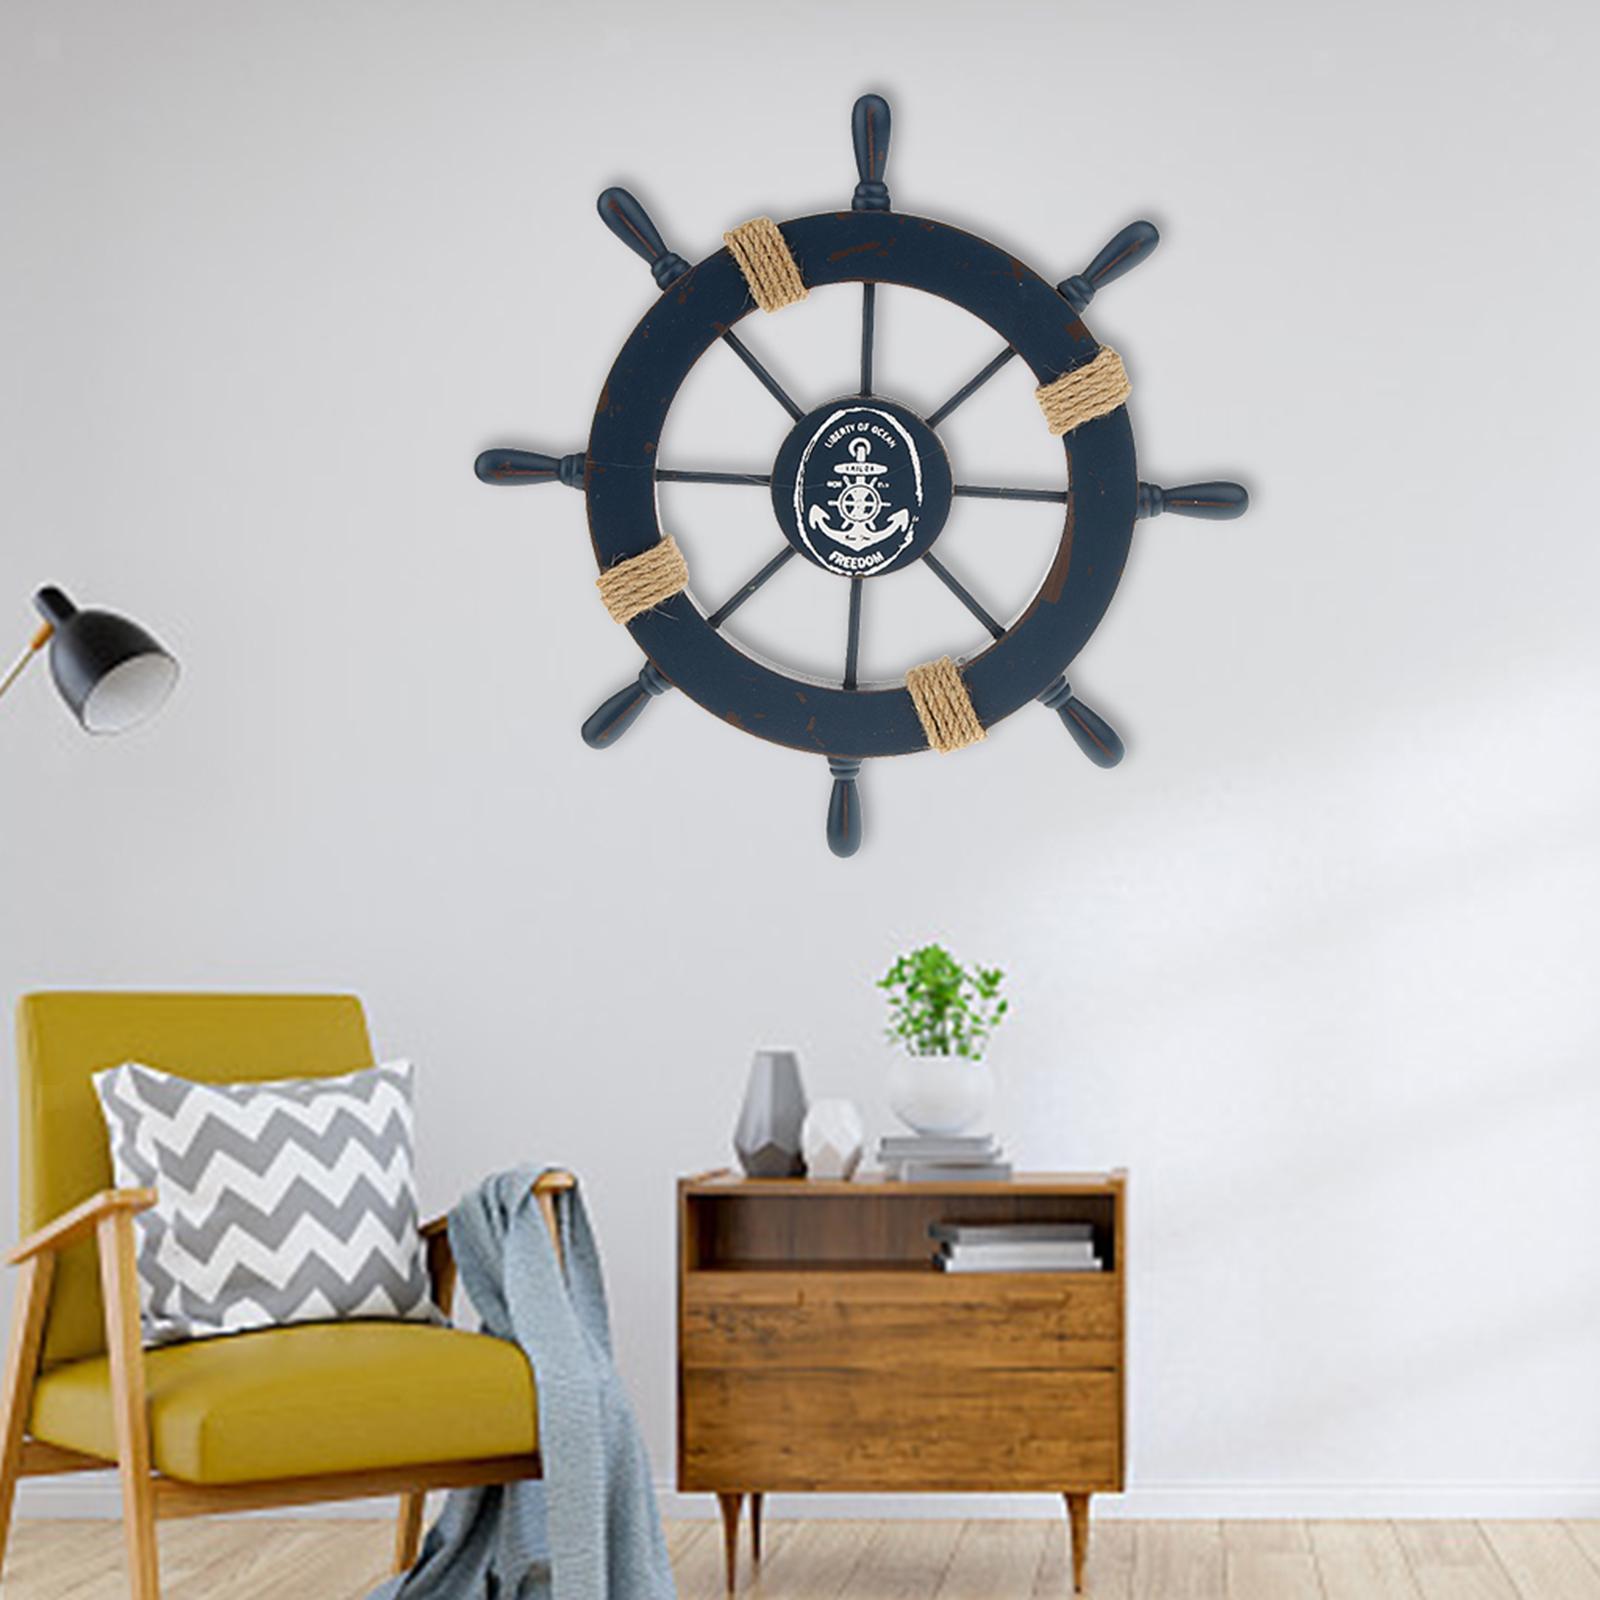 Nautical-Beach-Wooden-Boat-Ship-Wheel-Home-Bar-Wall-Party-Hanging-Decoration thumbnail 5